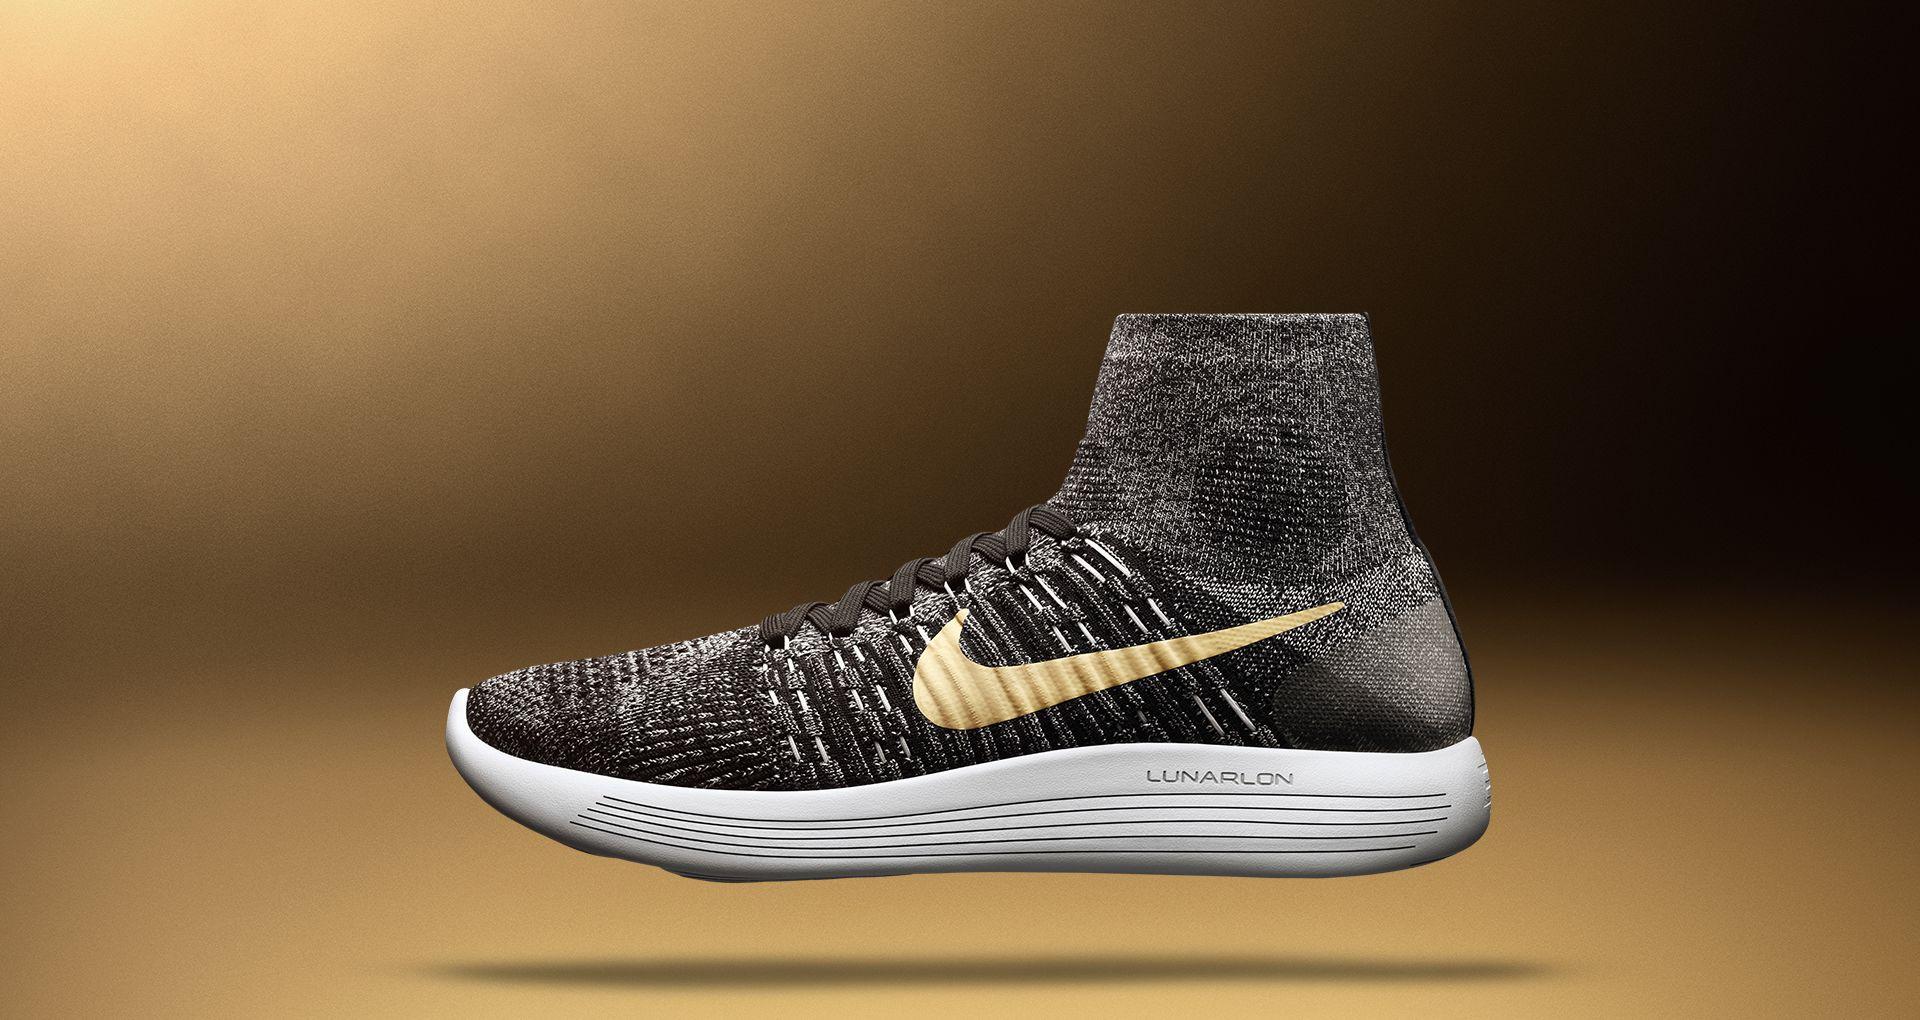 71f39a6dbcb799 Nike Lunarepic Flyknit BHM 2017. Nike+ SNKRS